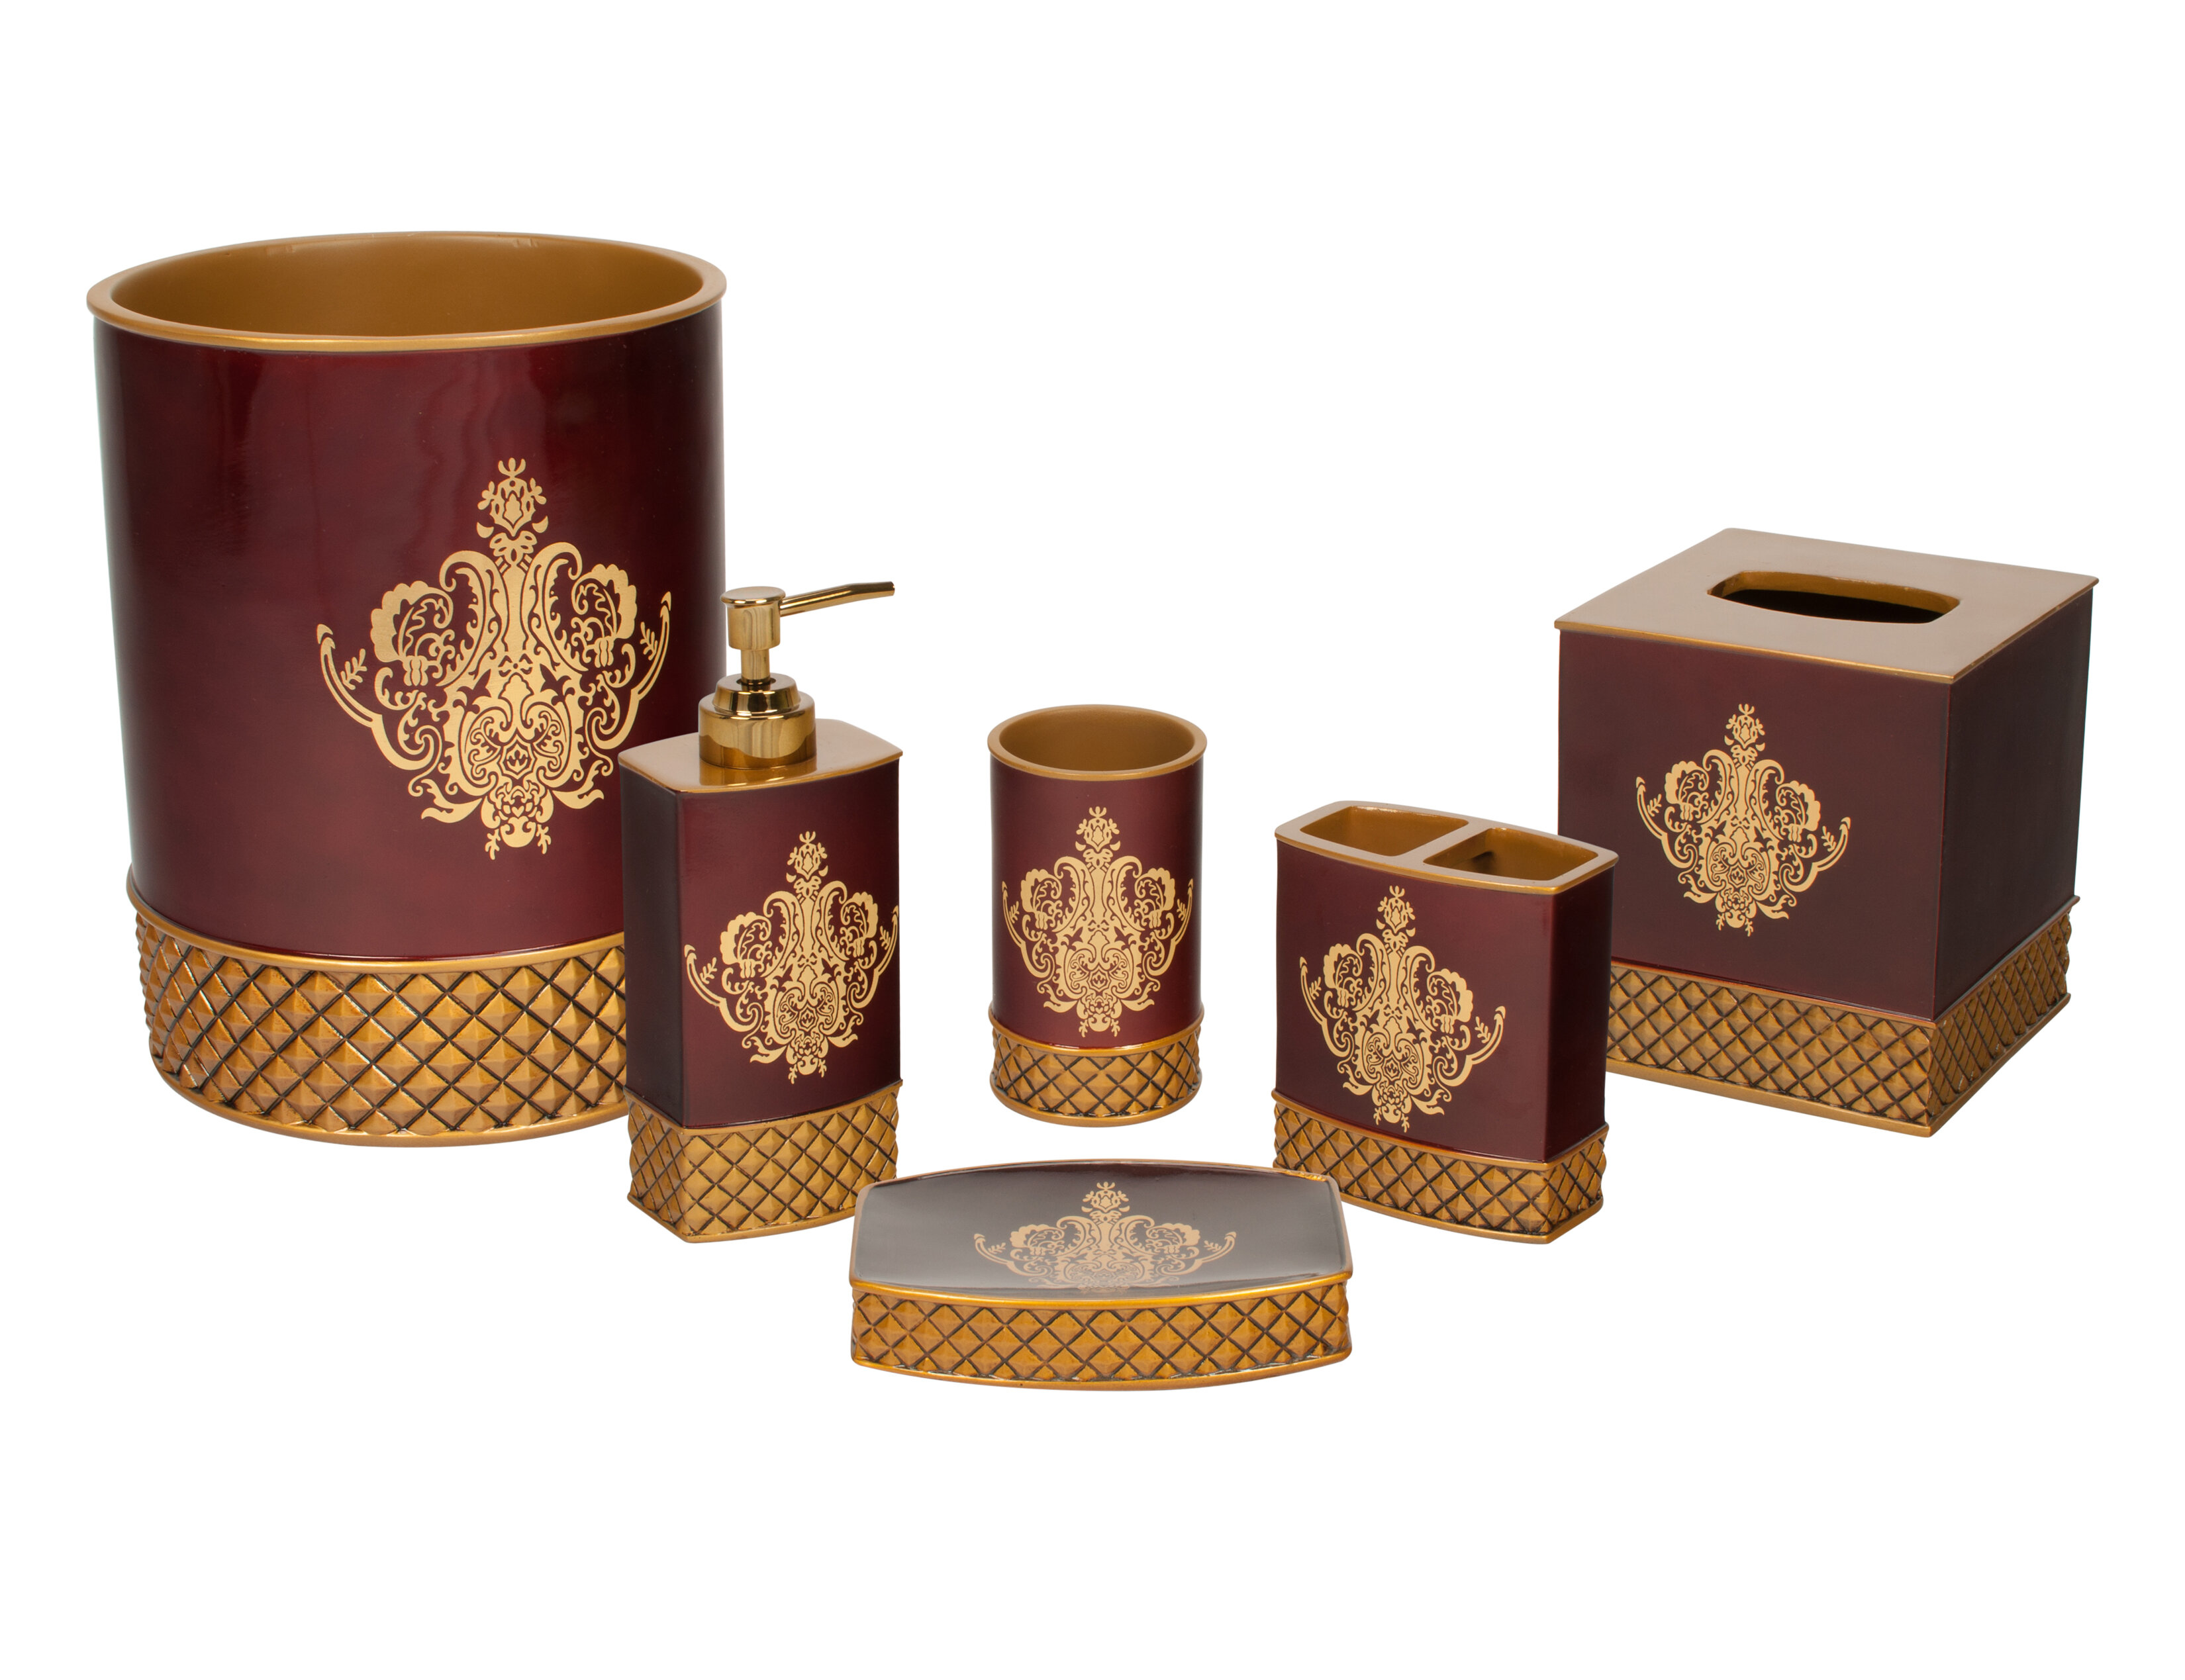 Kiara 5 Piece Bathroom Accessory Set